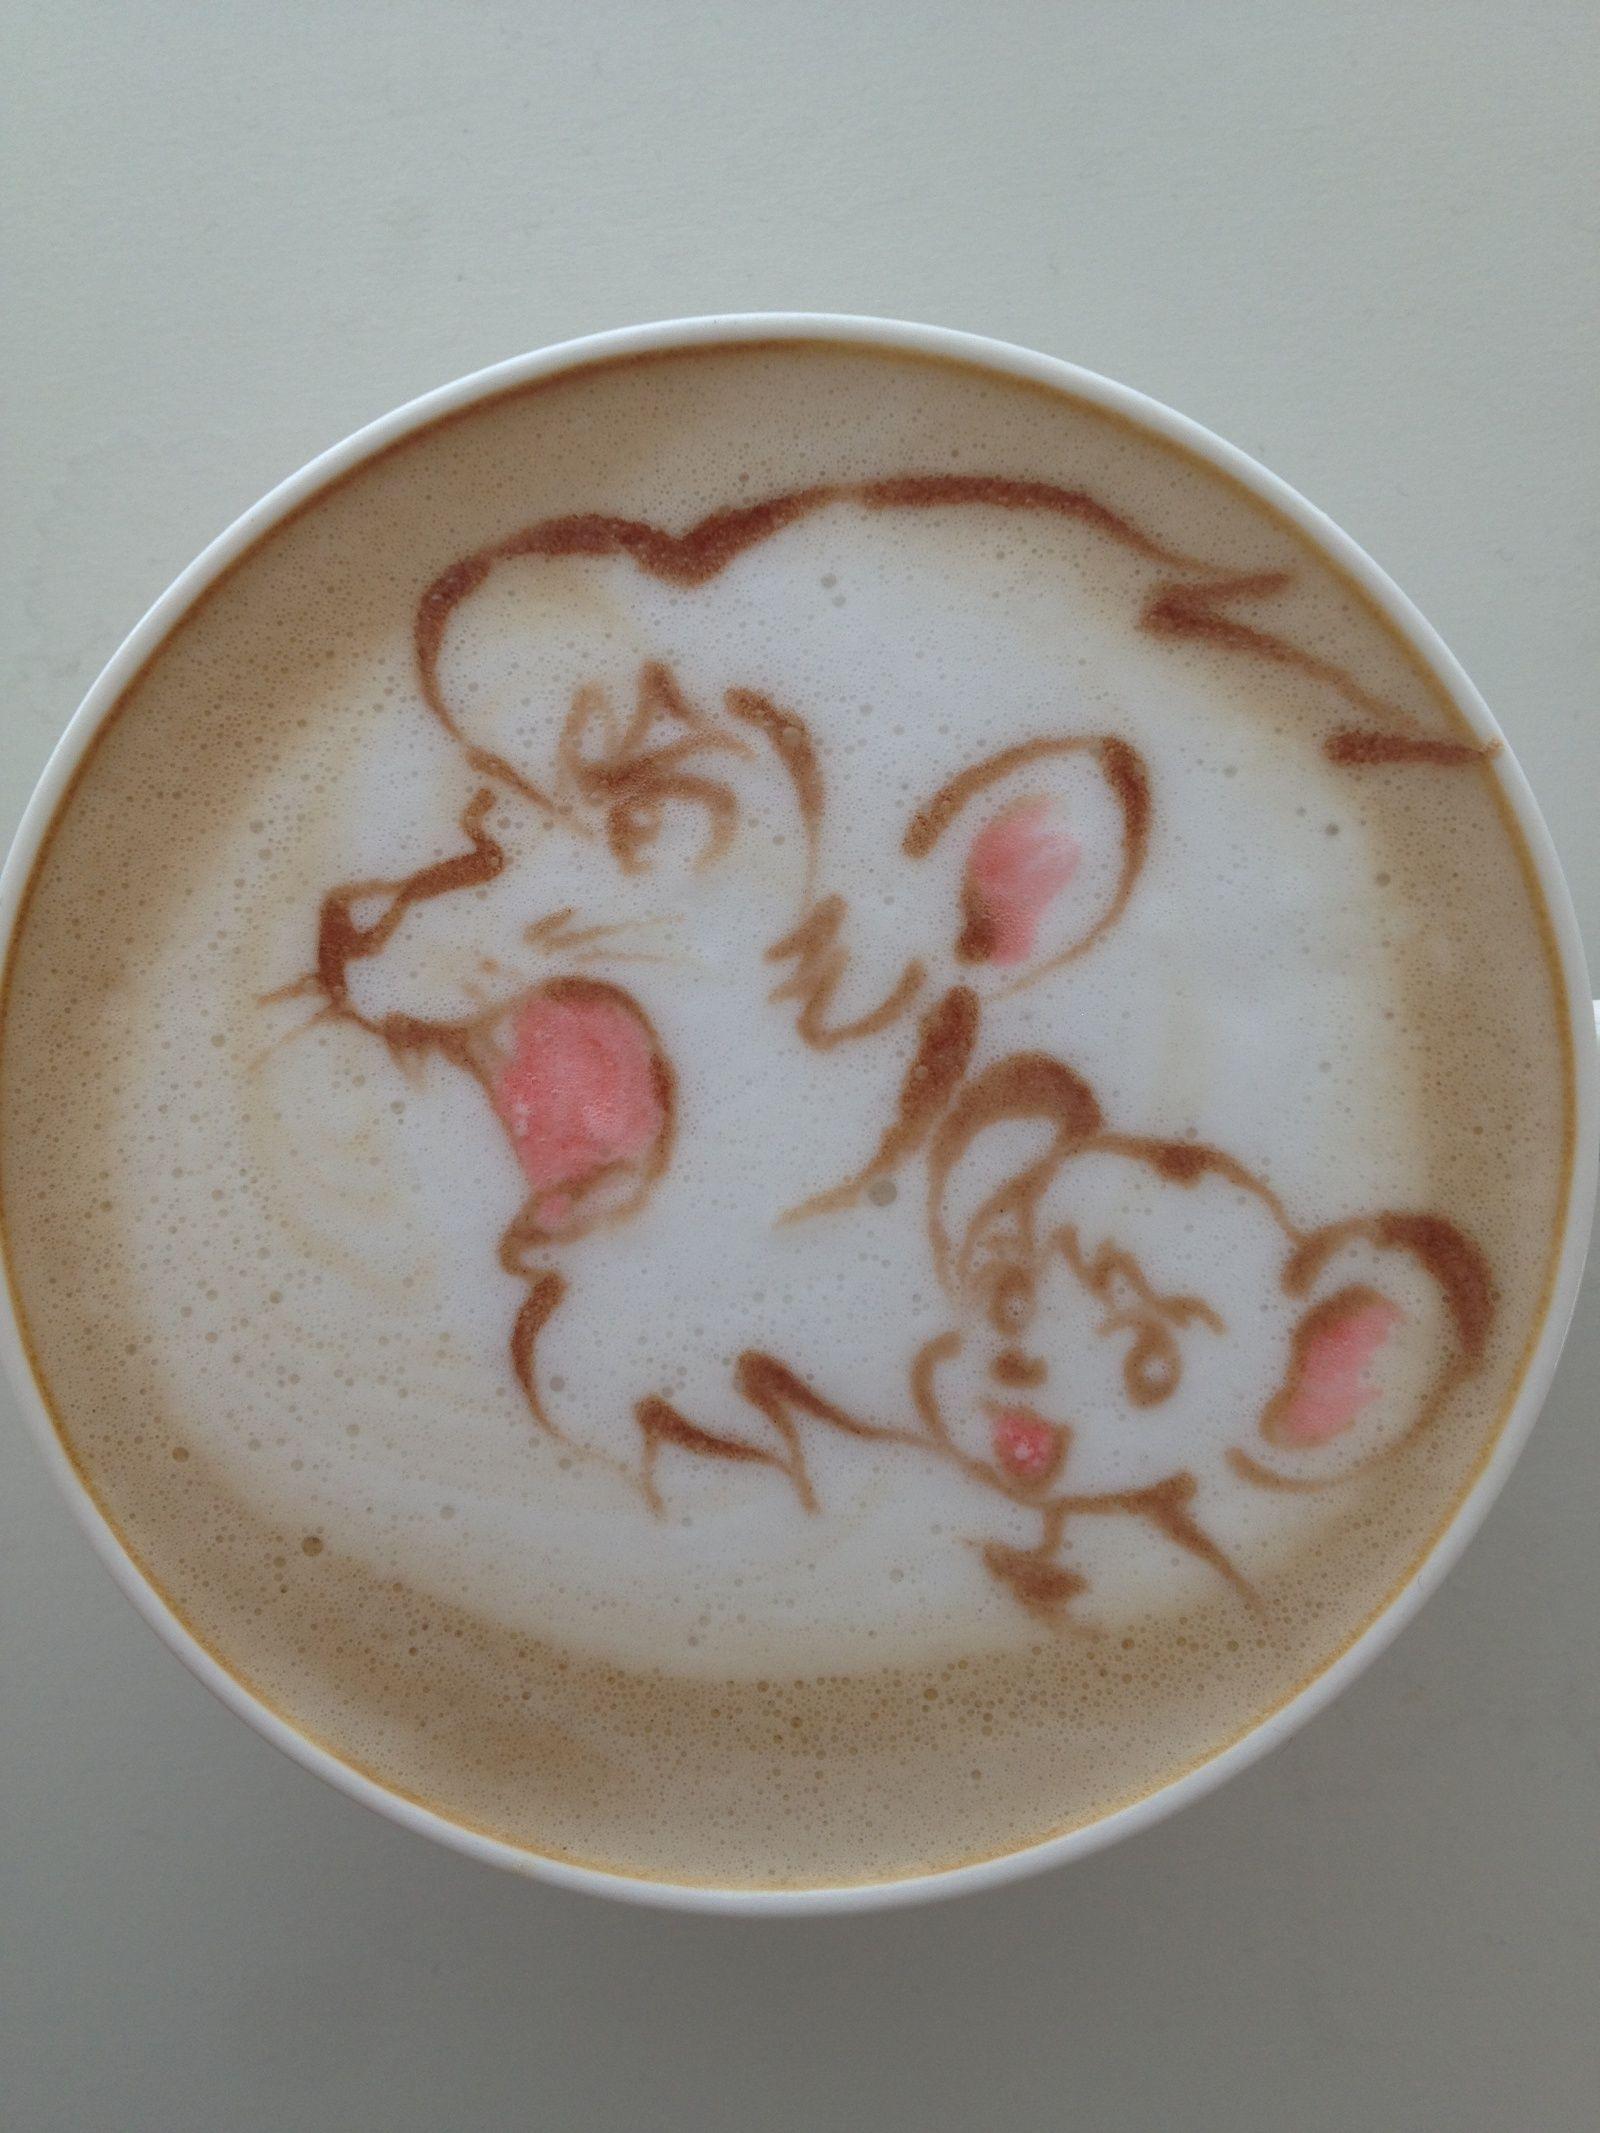 Kimba the white lion latte art coffee art coffee latte art